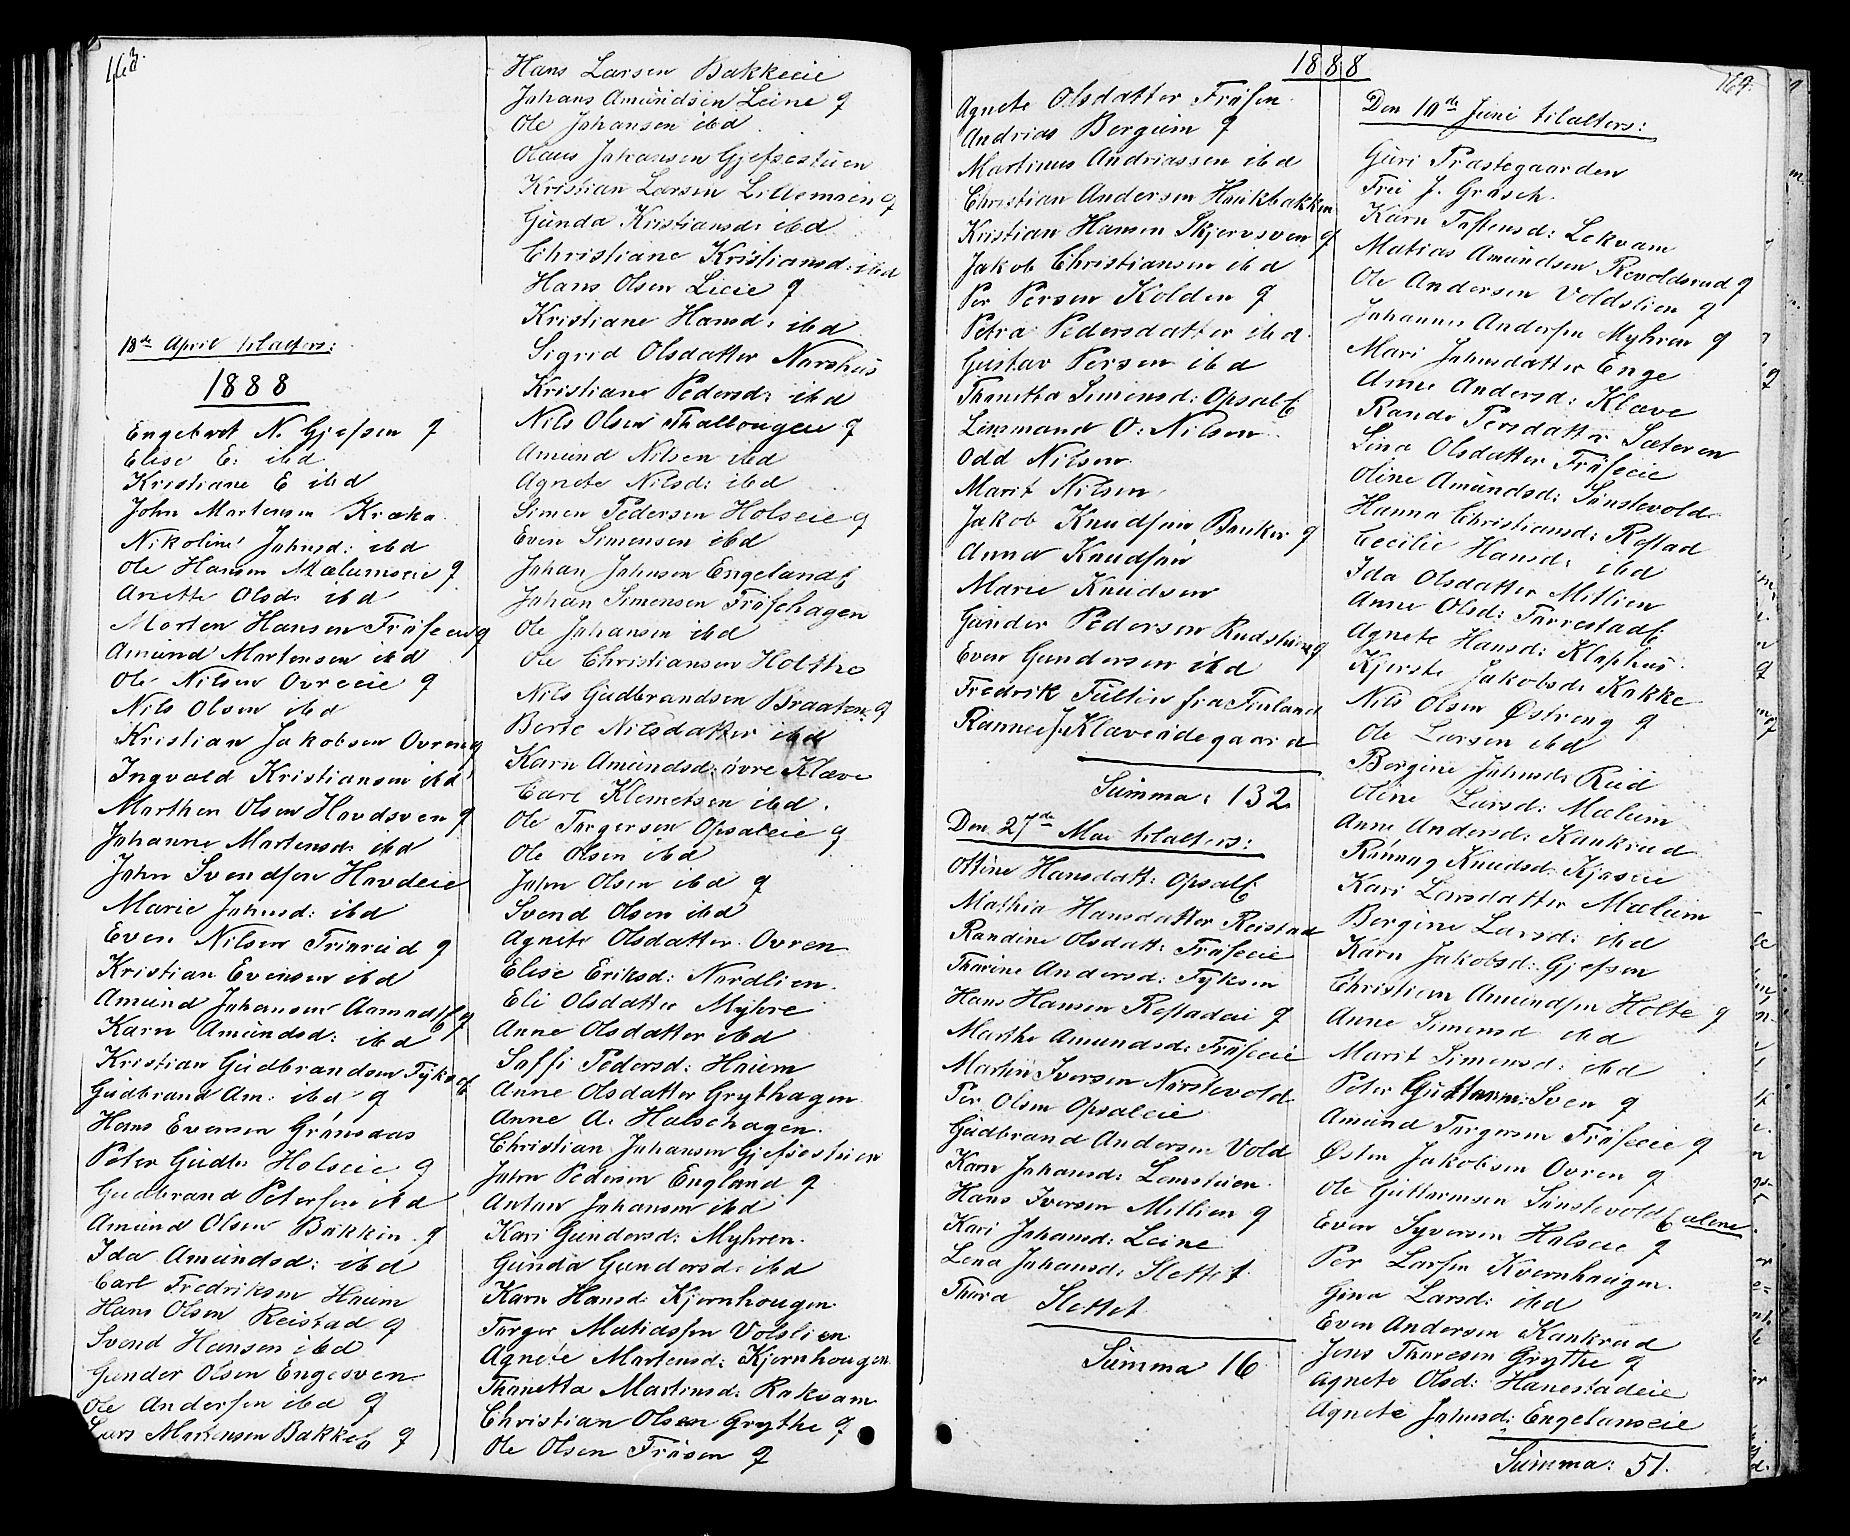 SAH, Østre Gausdal prestekontor, Klokkerbok nr. 1, 1863-1893, s. 163-164